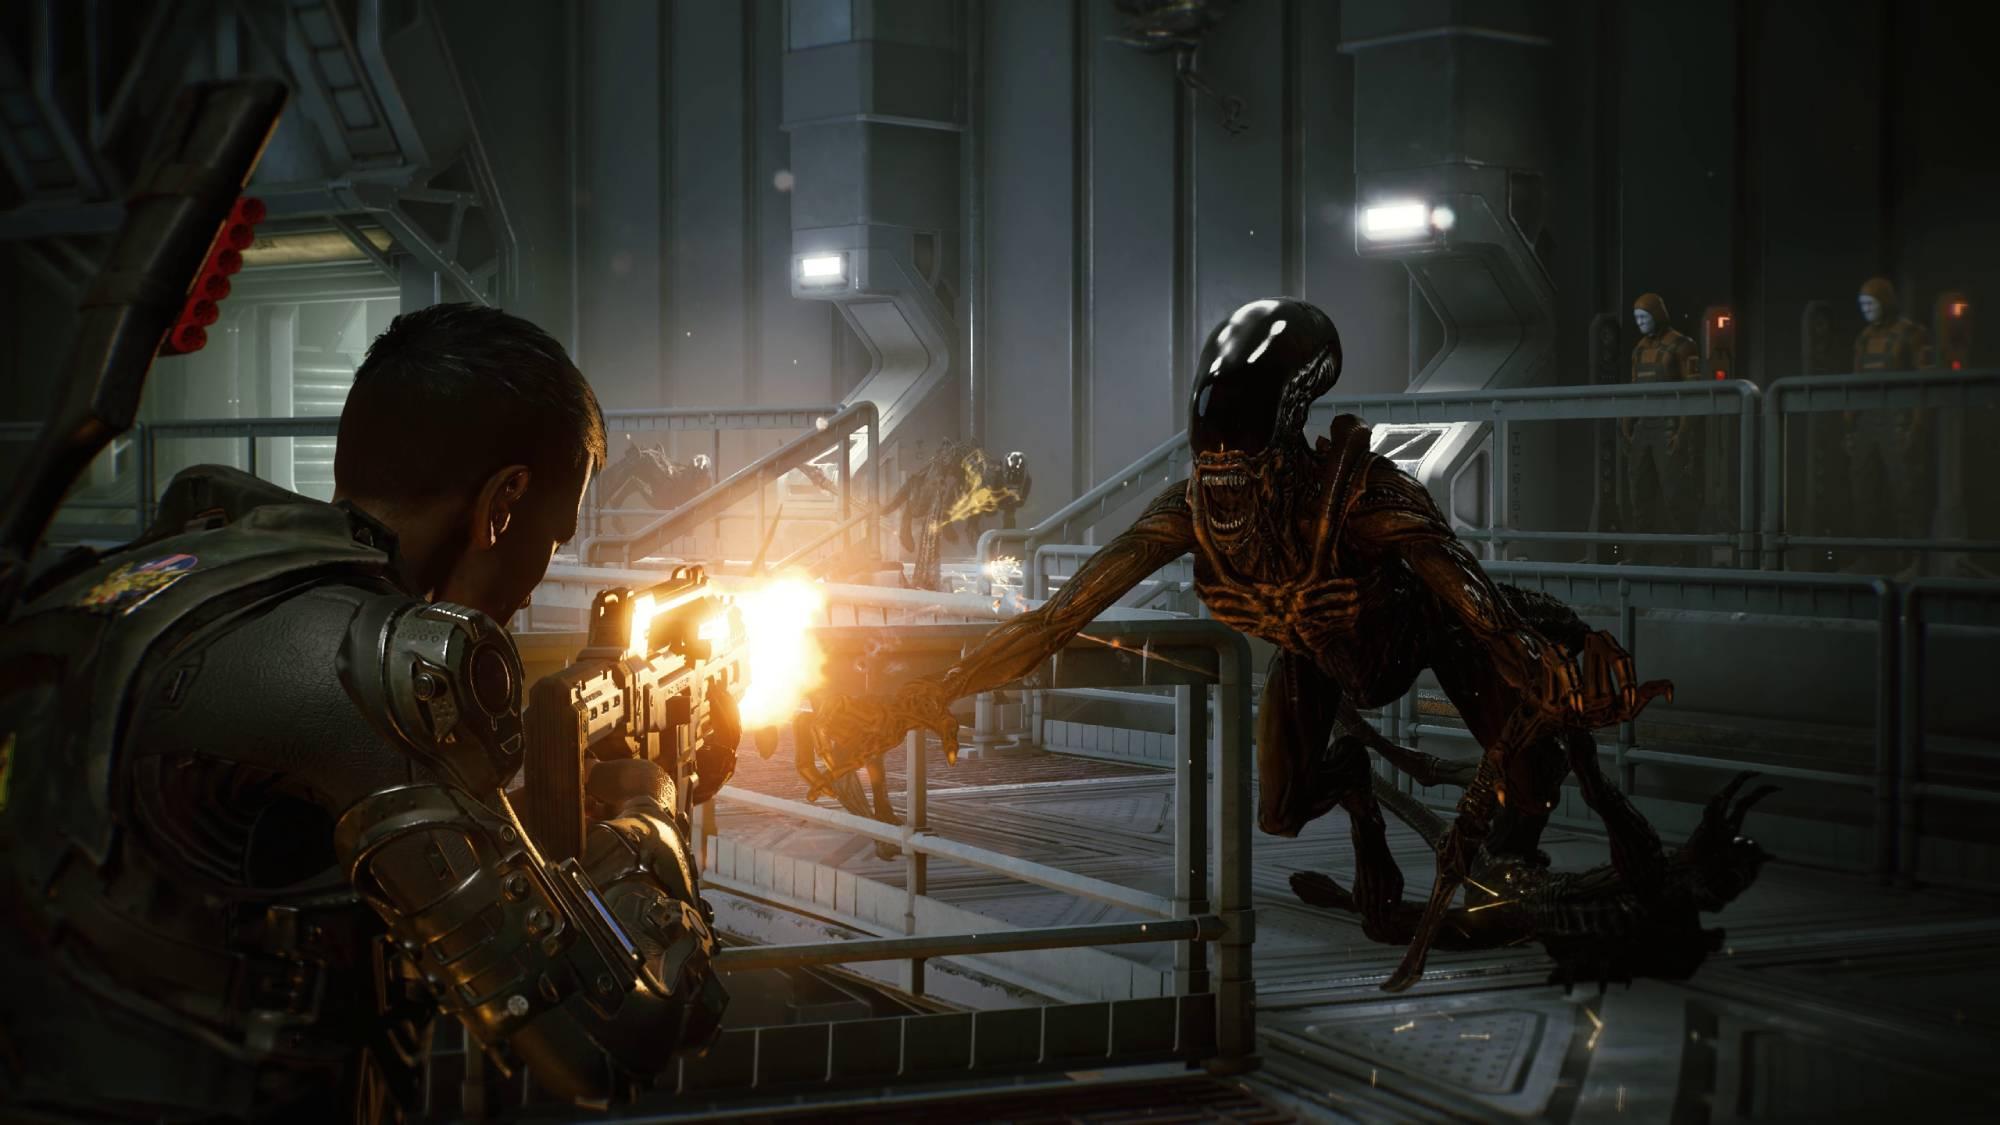 Cold Iron анонсировала кооперативный шутер Aliens: Fireteam 1